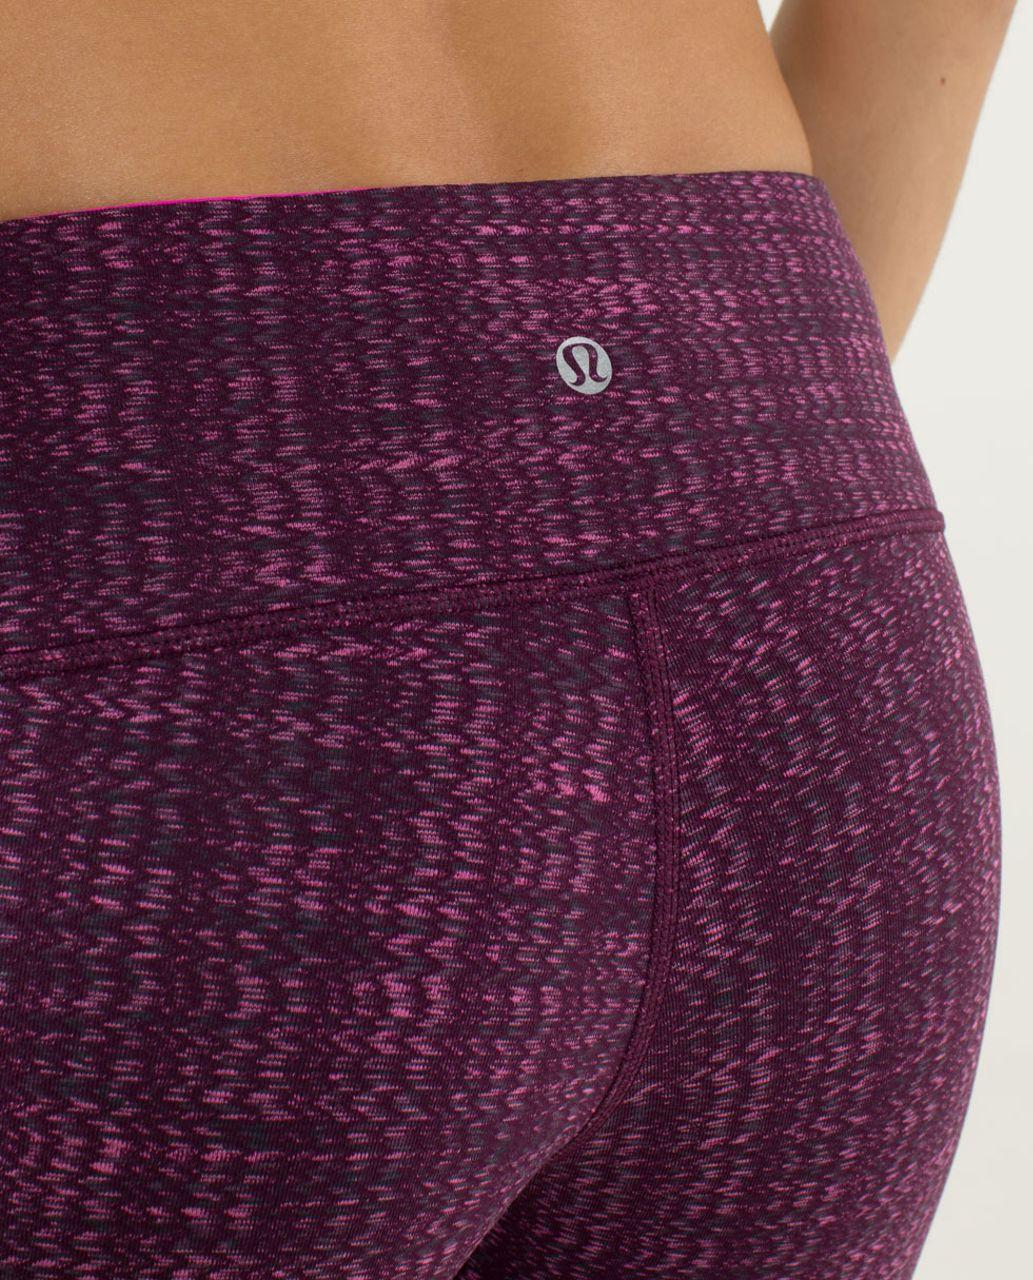 Lululemon Wunder Under Pant *Textured - Ziggy Wee August Glo / Raspberry Glo Light